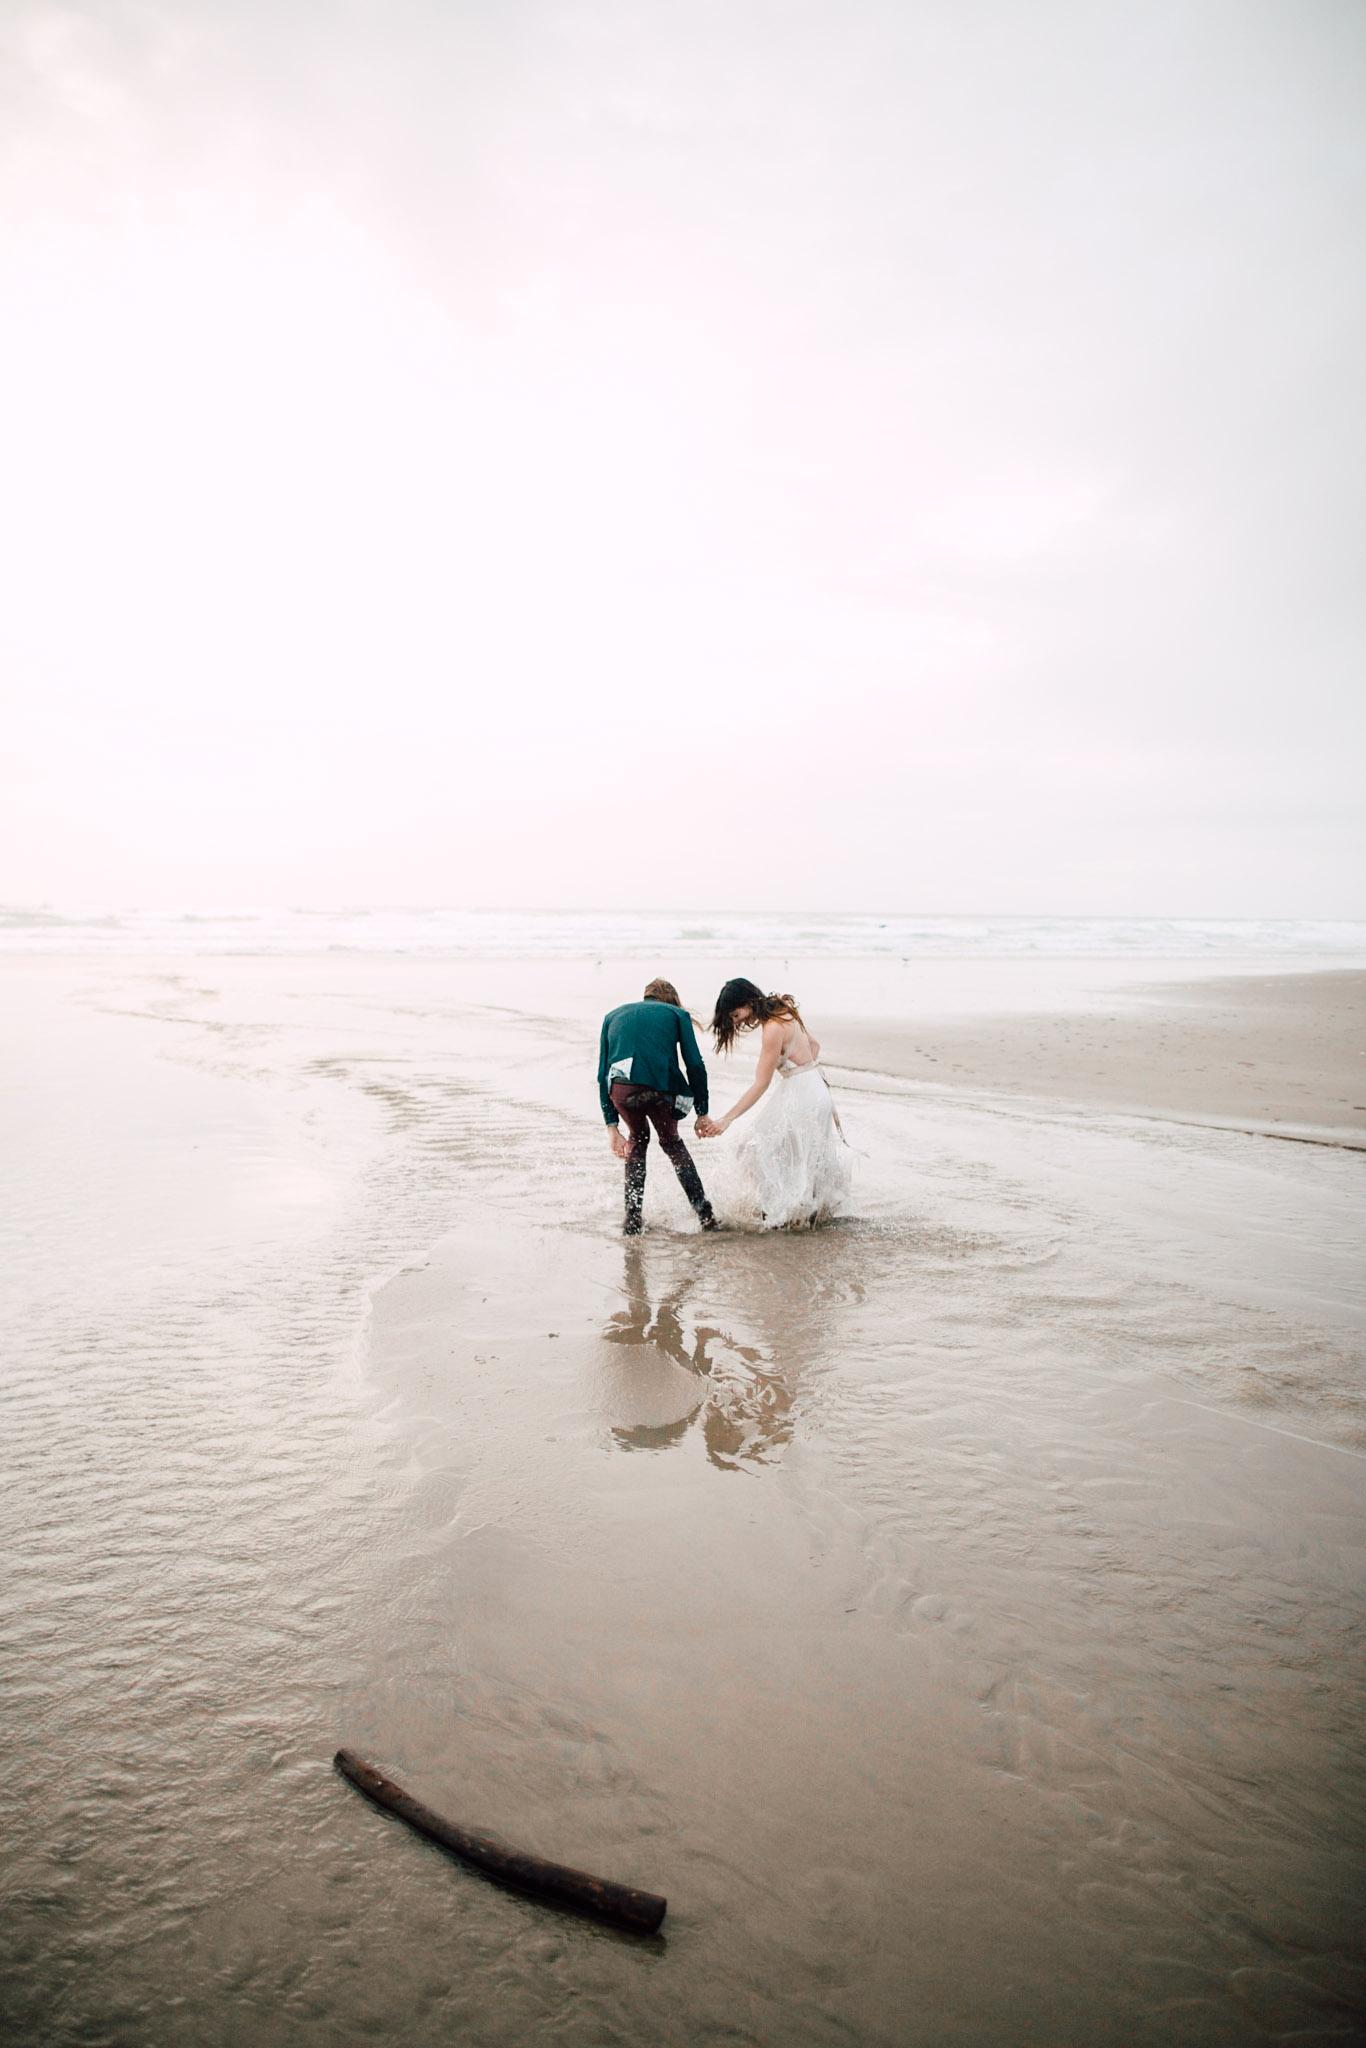 Oregon-Coast-Manzanita-Beach-Engagement-Pia-Anna-Christian-Wedding-Photography-PNW-GB-30.jpg